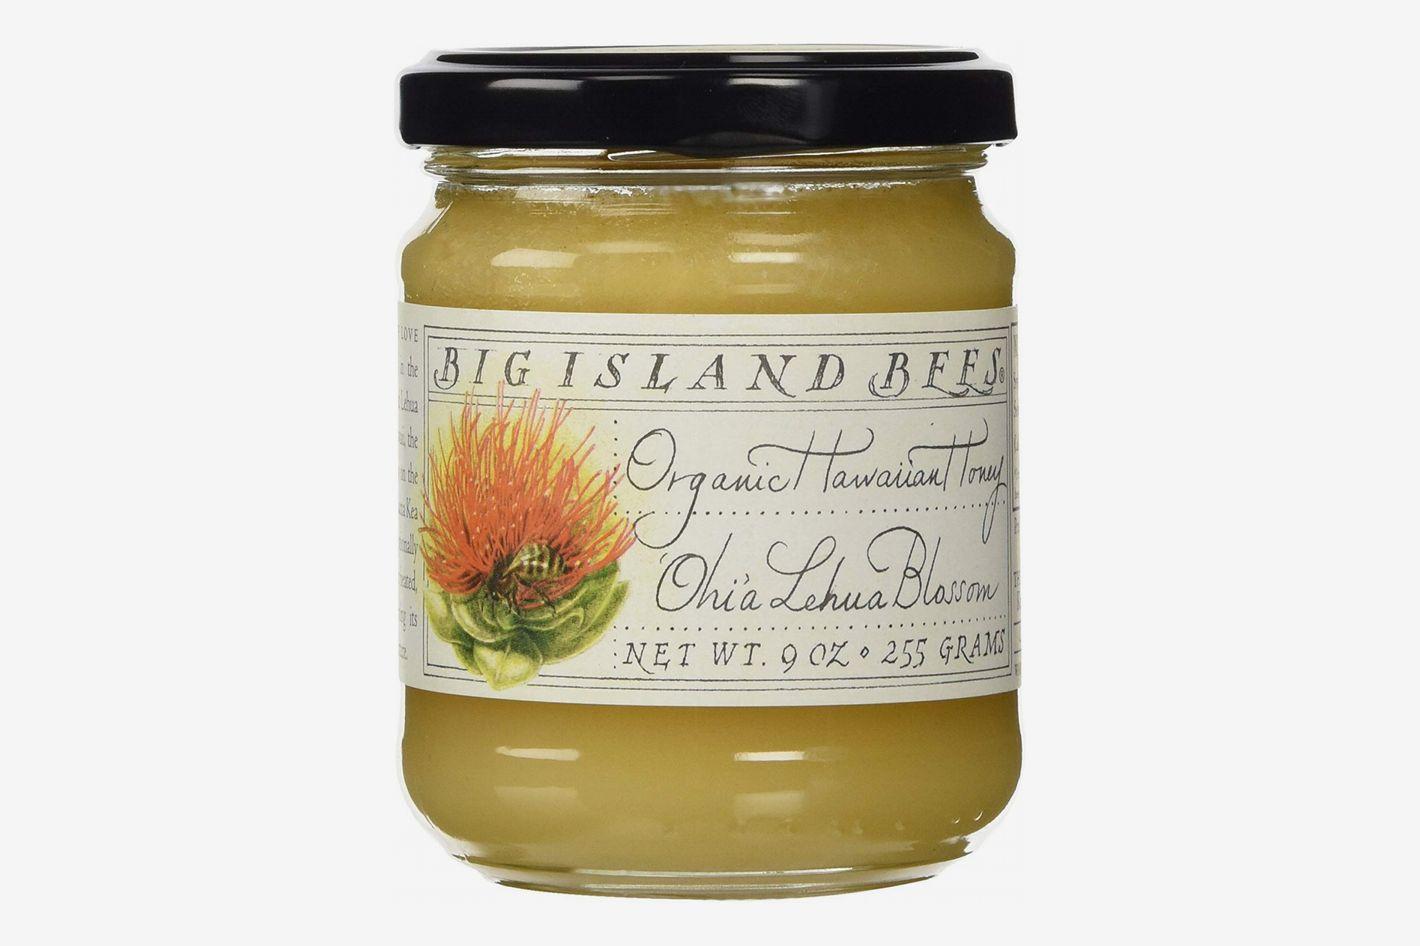 Organic Ohia Lehua Blossom Raw Hawaiian Honey, Single Floral Variety by Big Island Bees